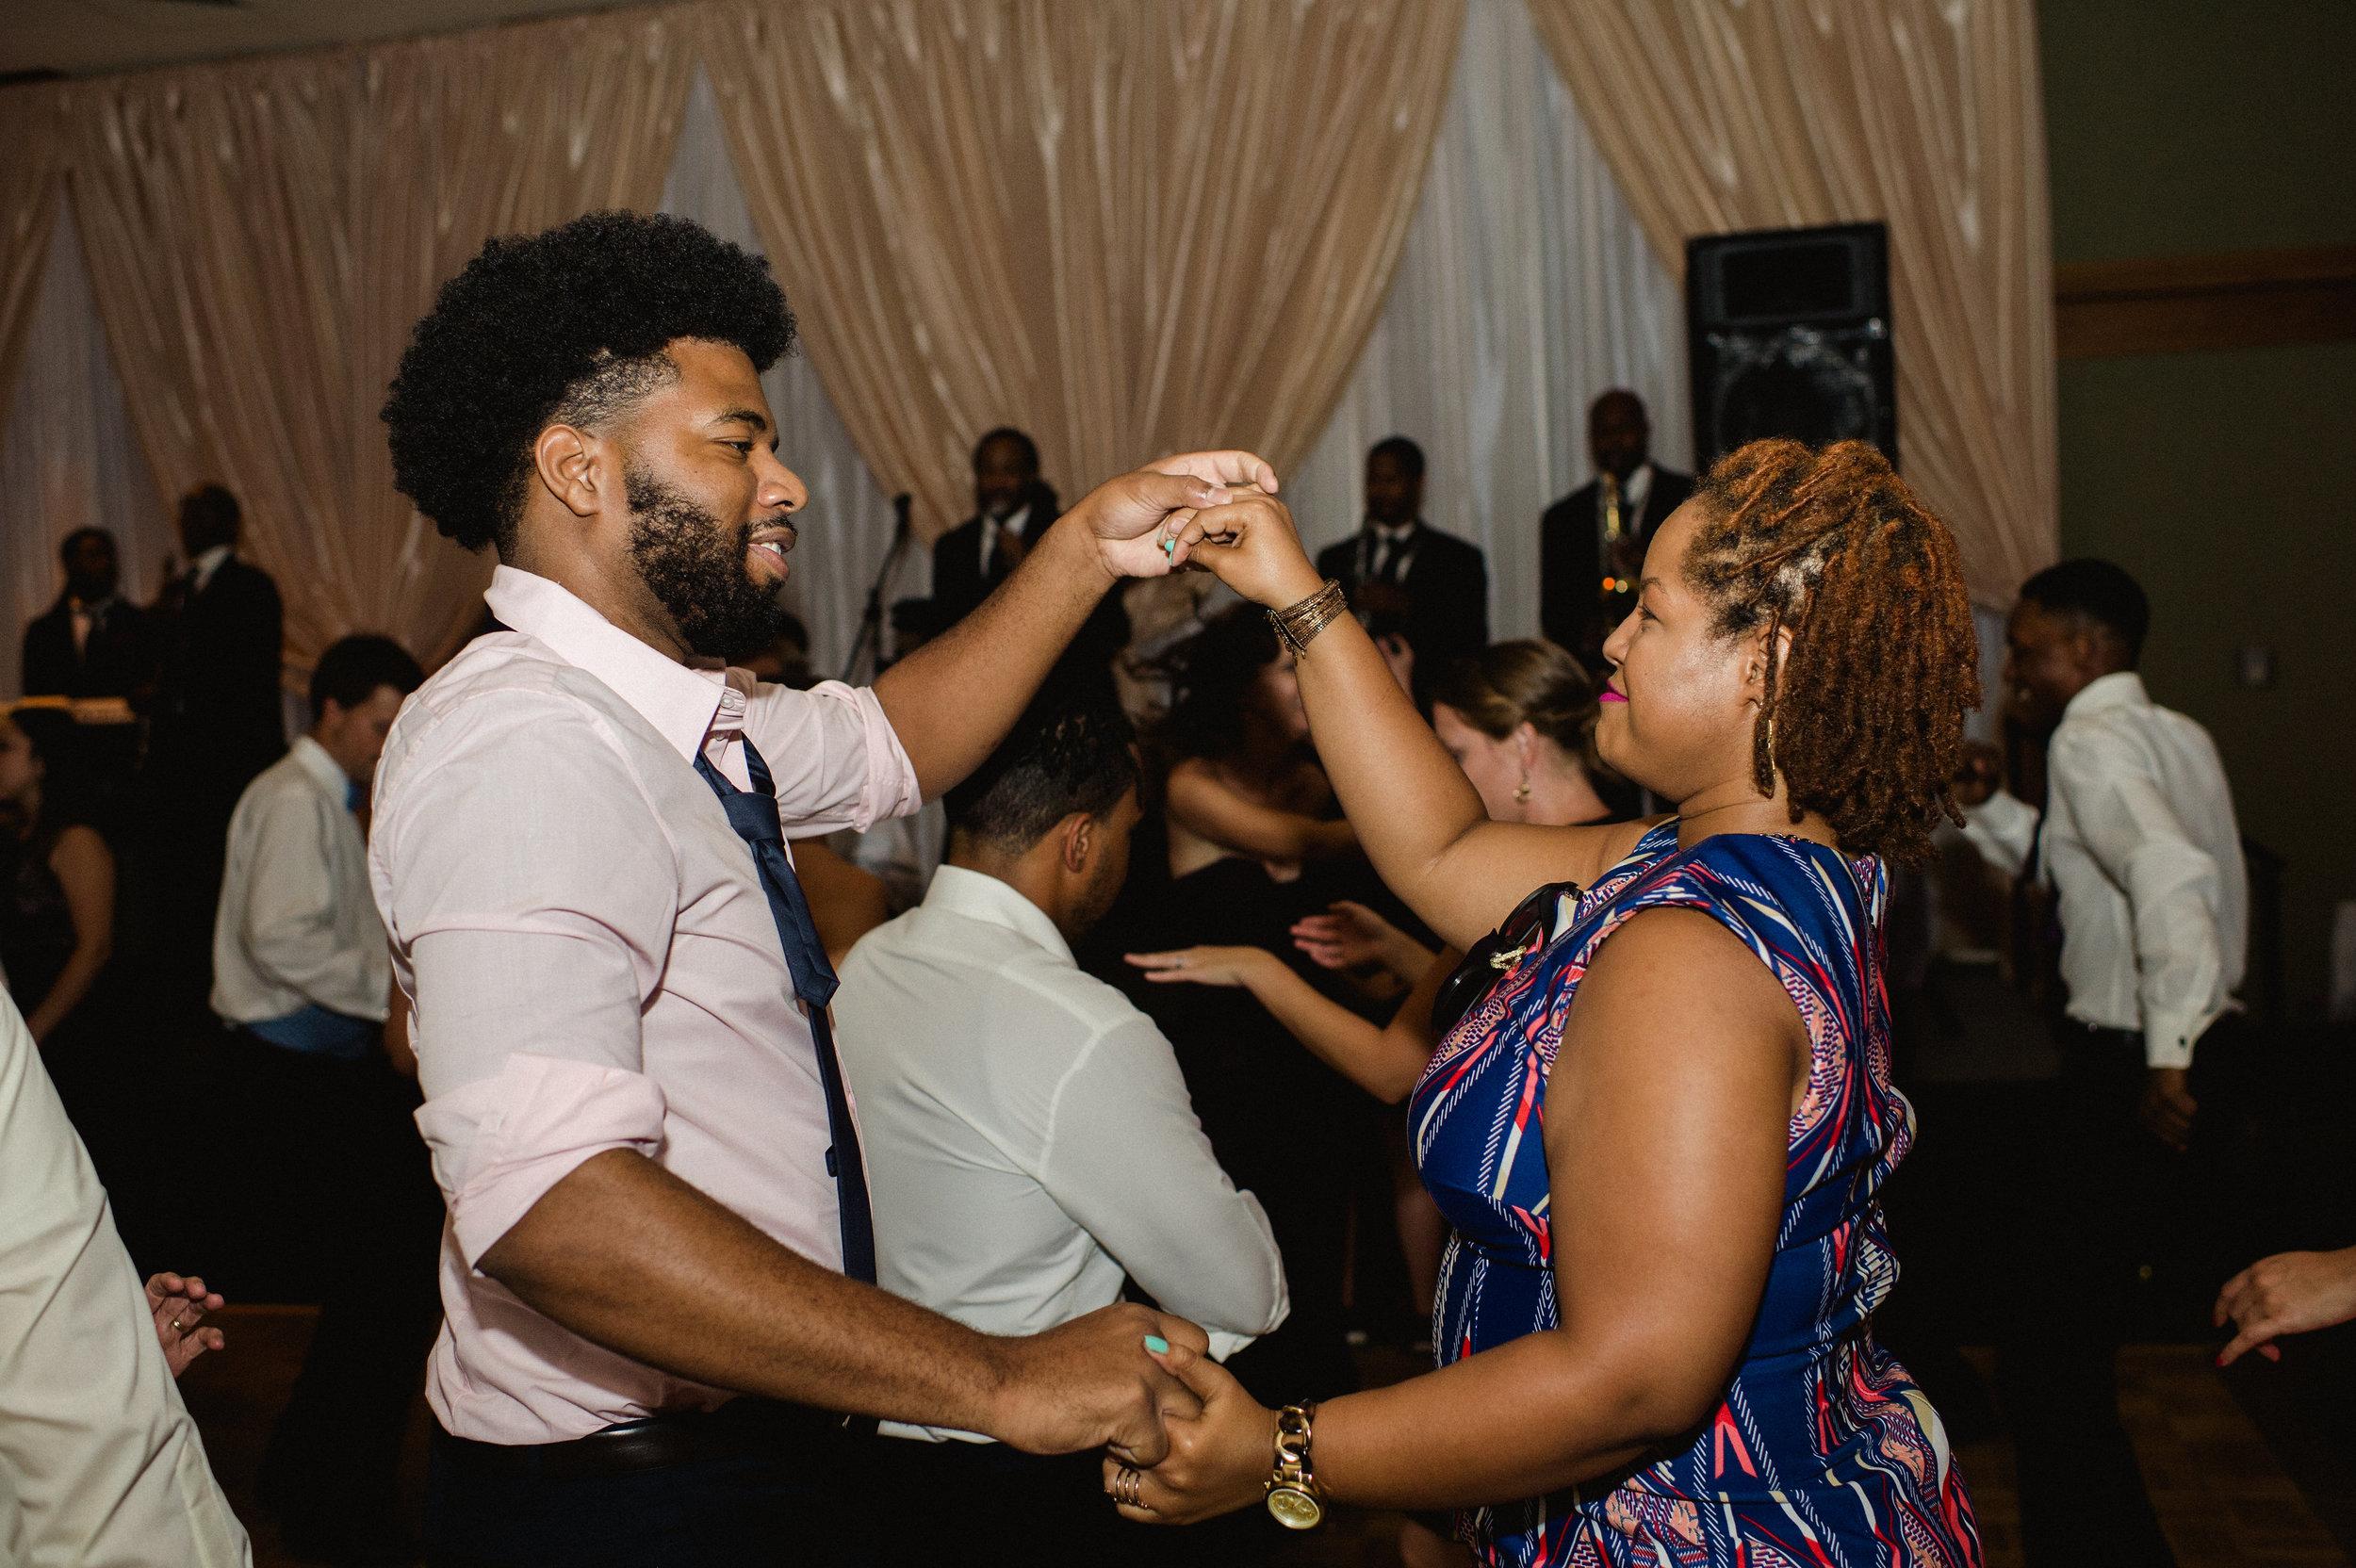 imani&chris|wedding|reception-534.jpg